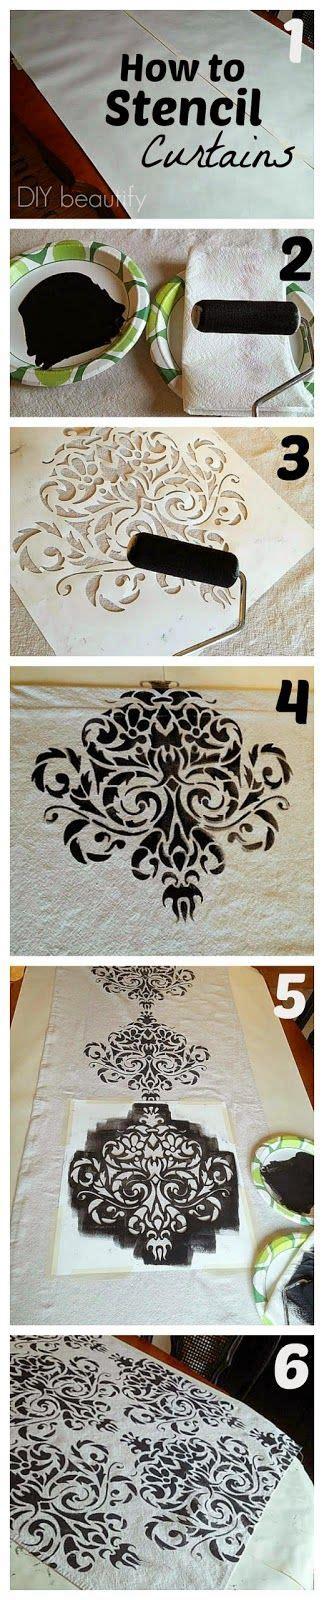 stenciled drop cloth diy crafts ideas knock ballard inspired curtains